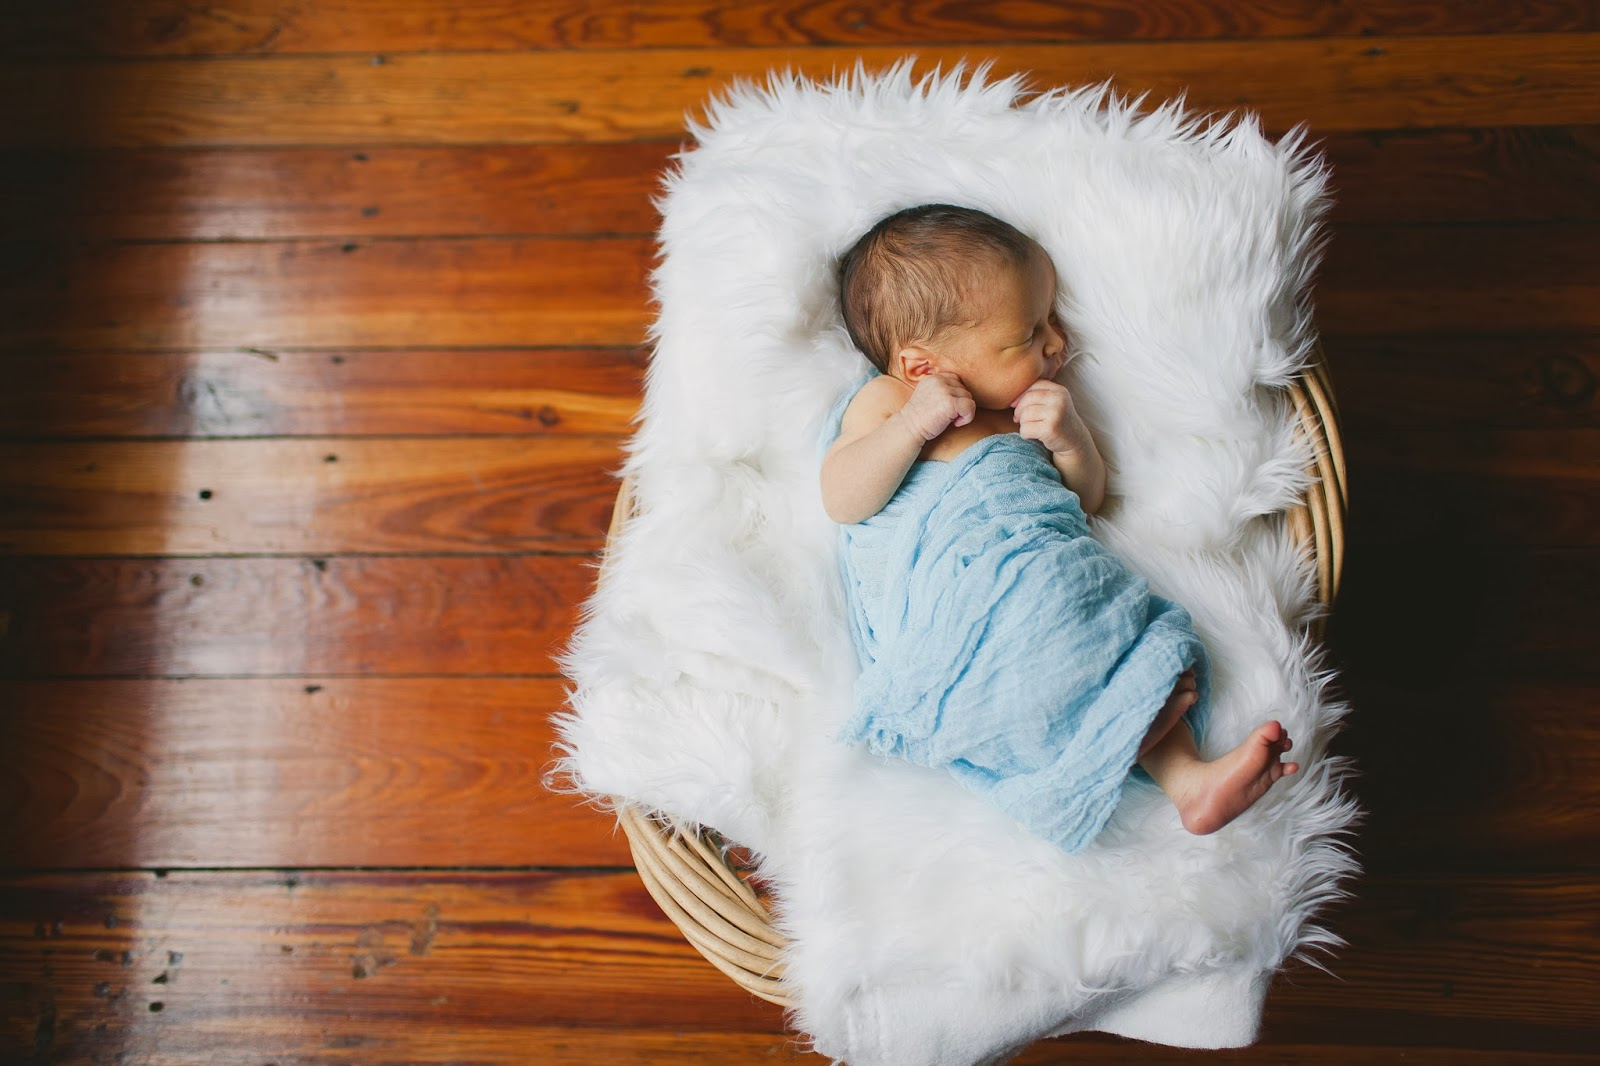 marisa taylor photography, newborn photographer, delaware photogrpaher, delaware newborn photographer